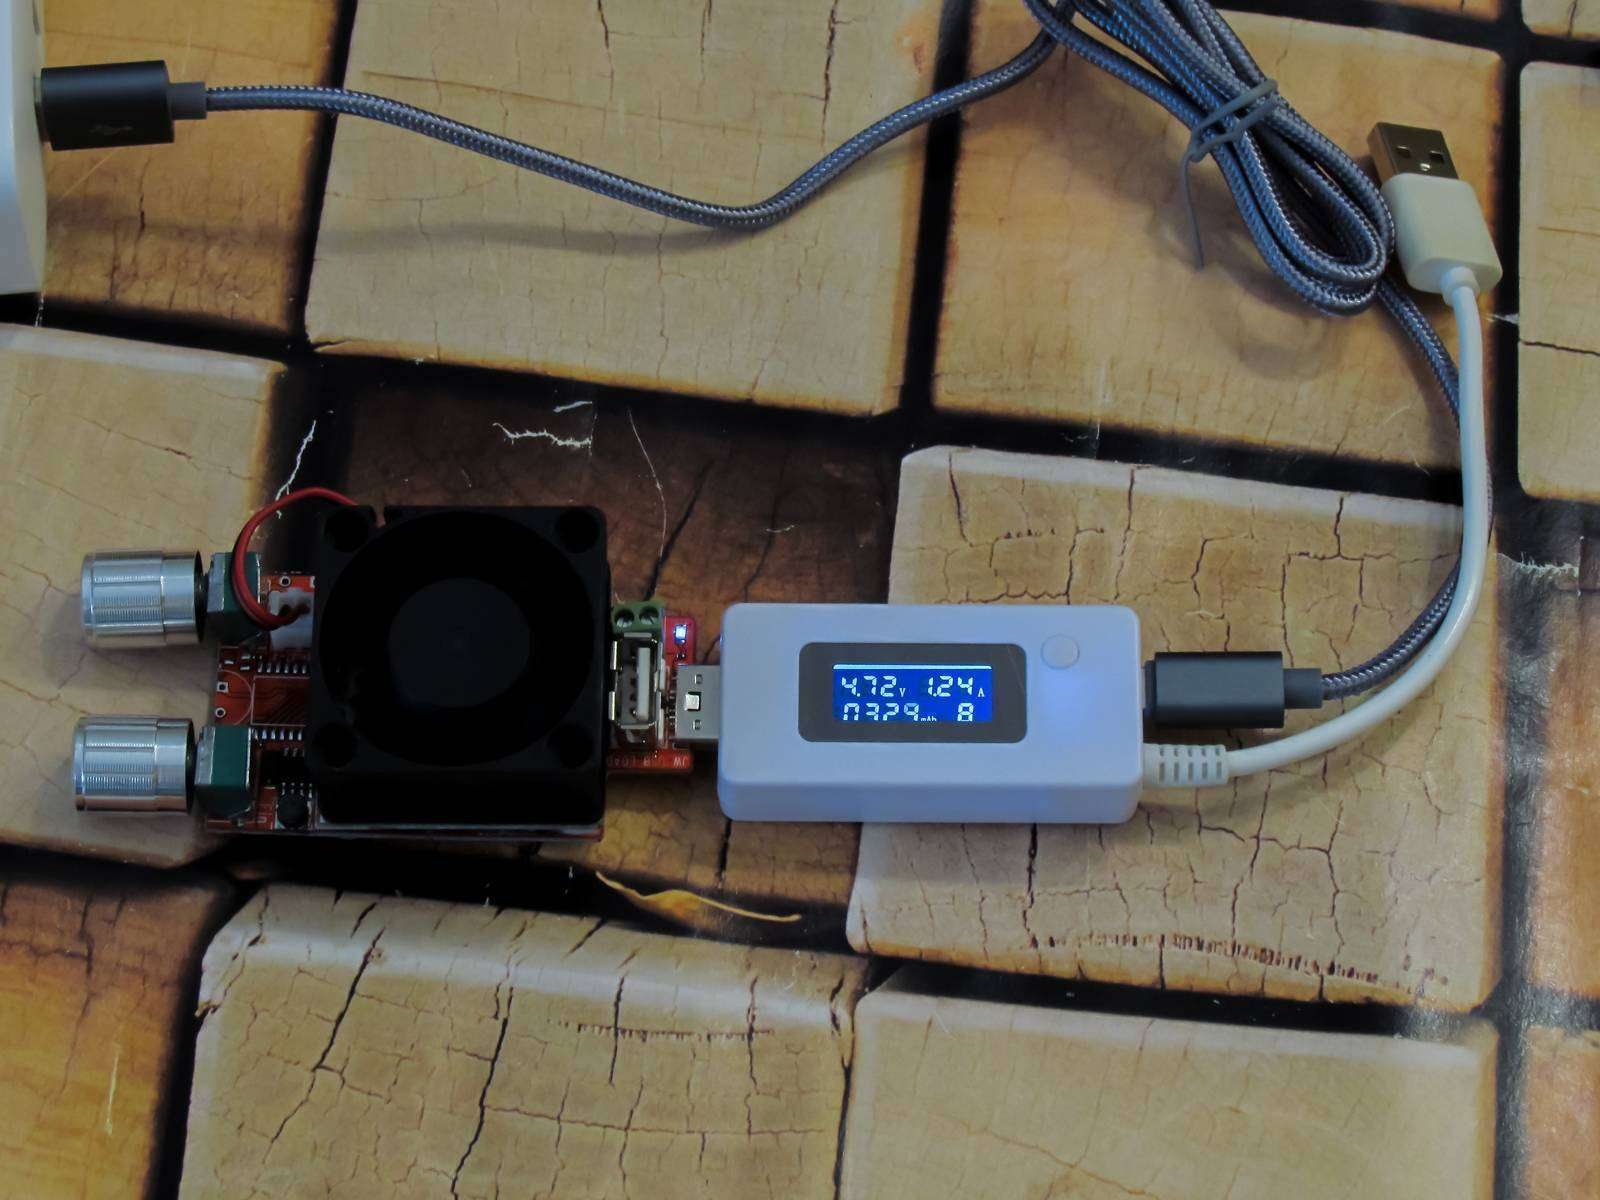 Aliexpress: Пара Micro Usb кабелей SUQIN с распродажи на Алиэкспресс